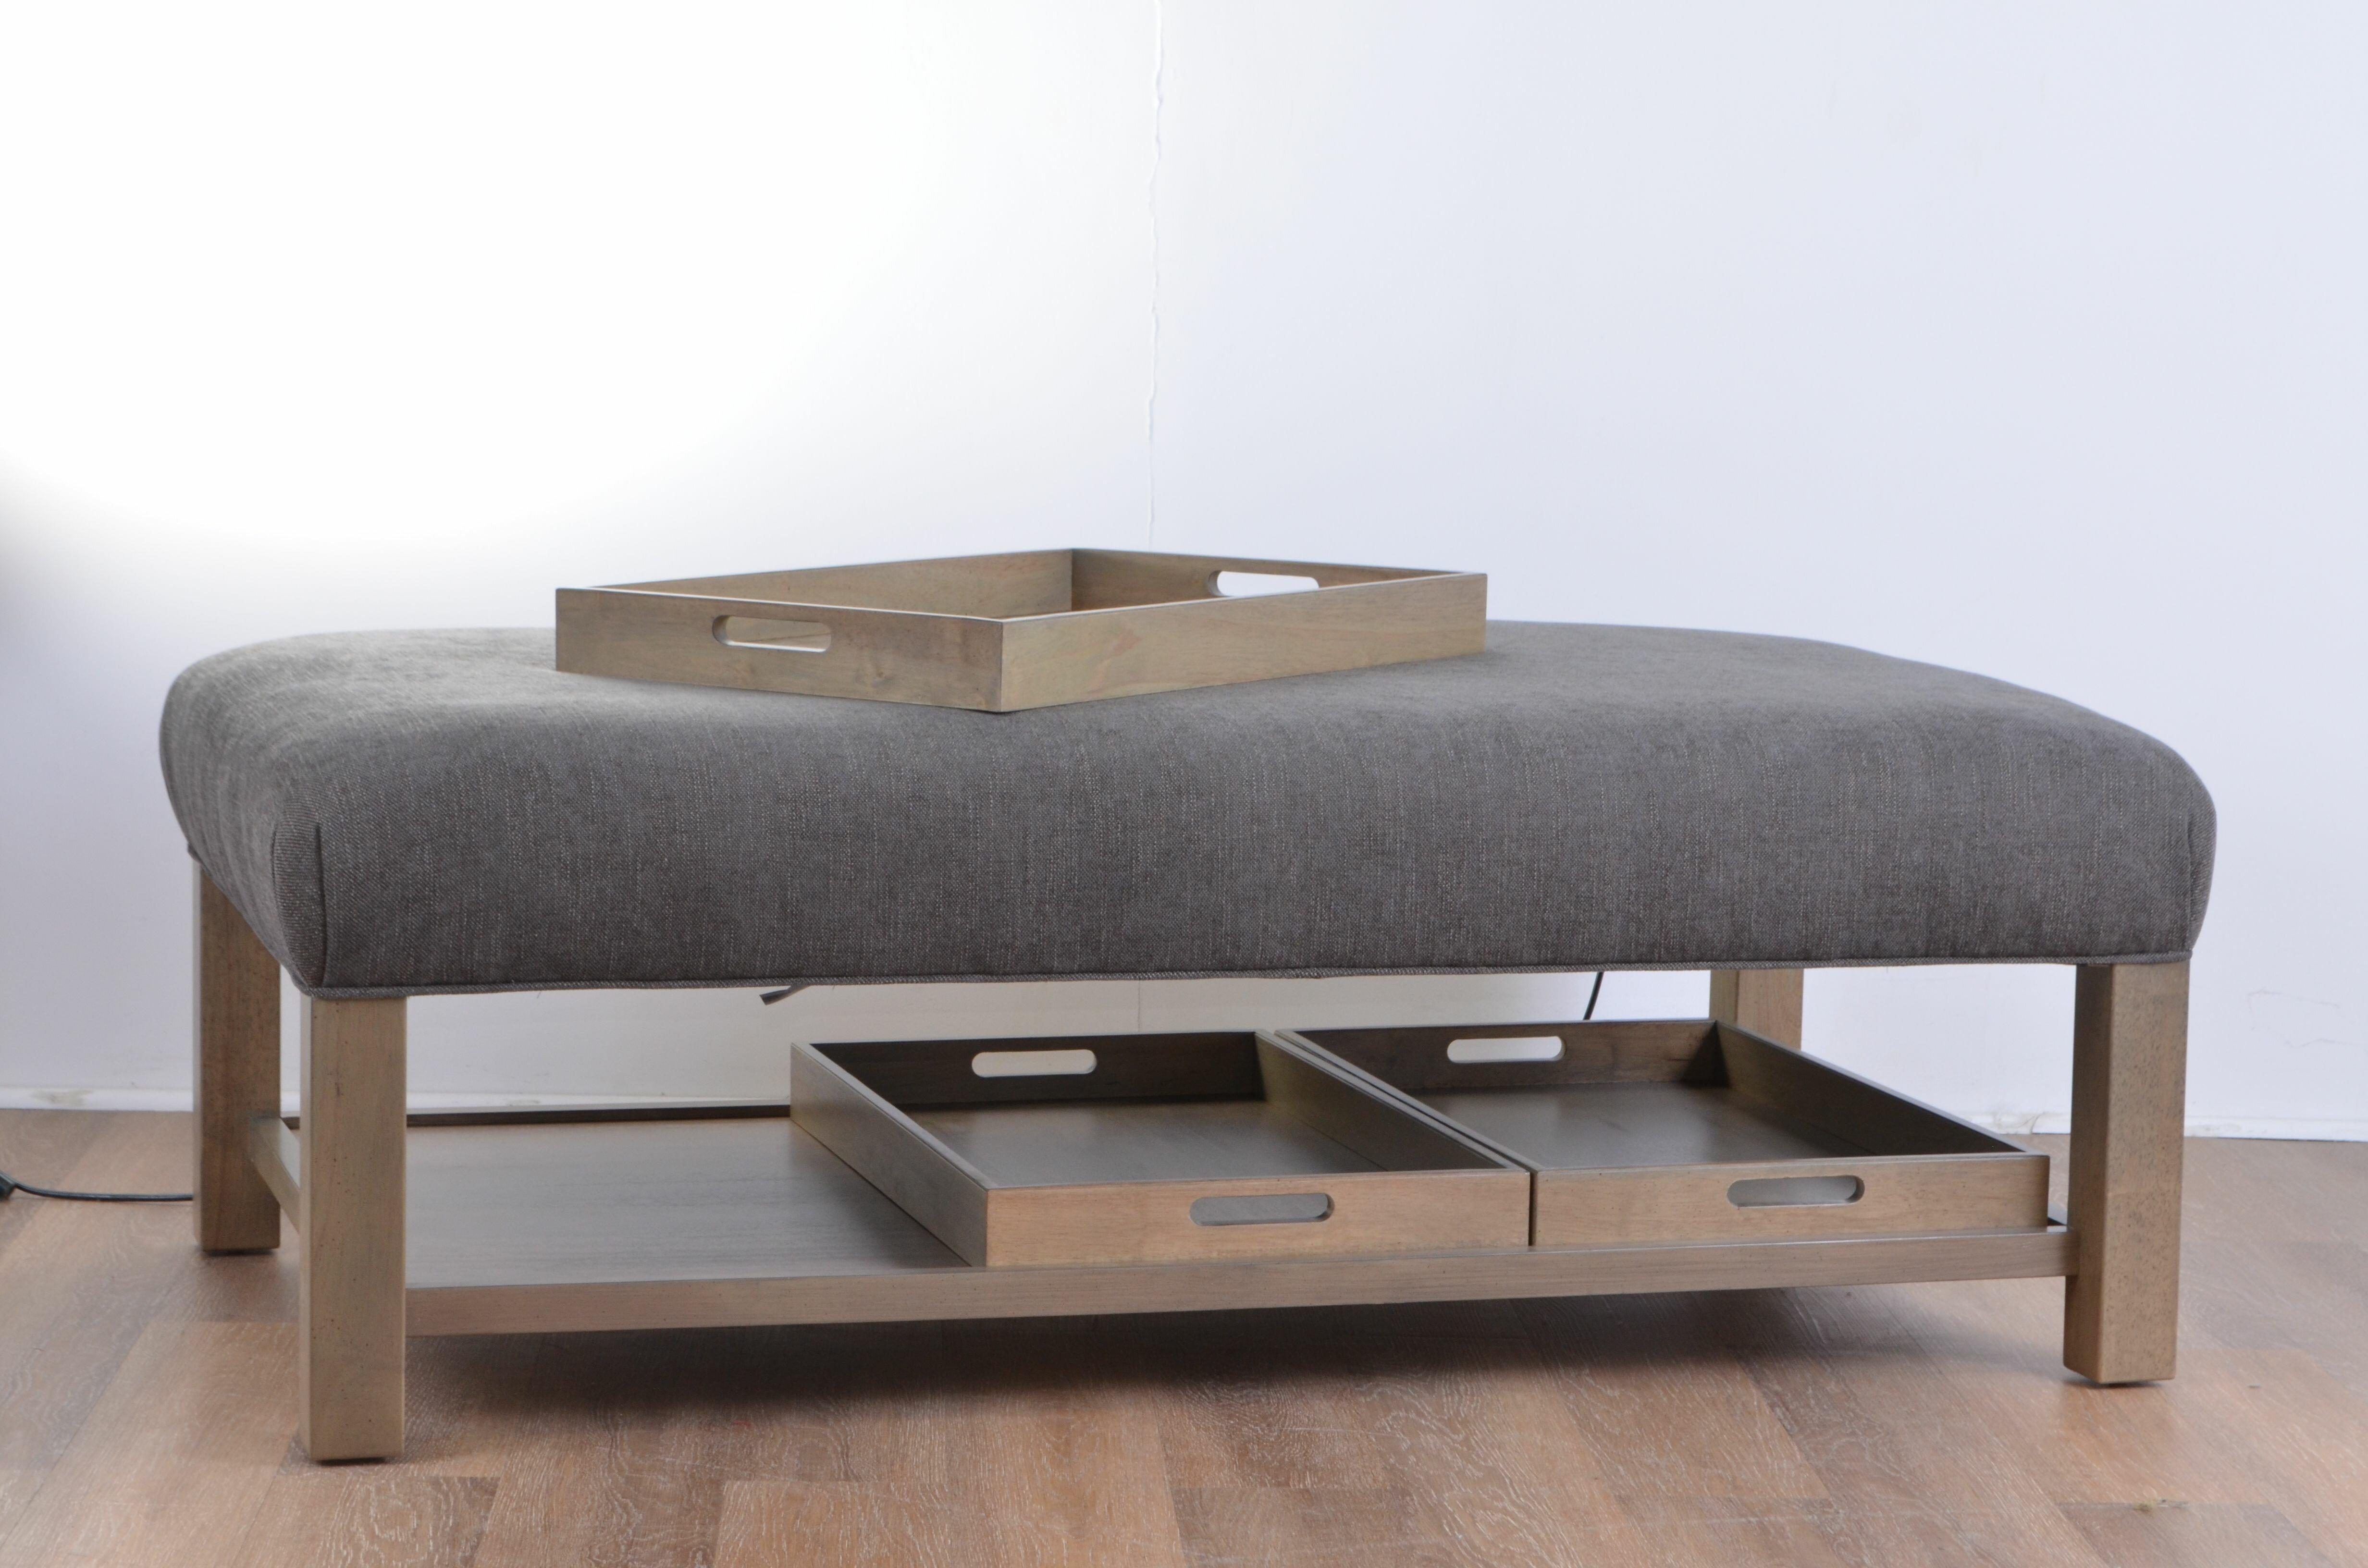 Stupendous Craftmaster Avignon Cocktail Ottoman Wayfair Cjindustries Chair Design For Home Cjindustriesco